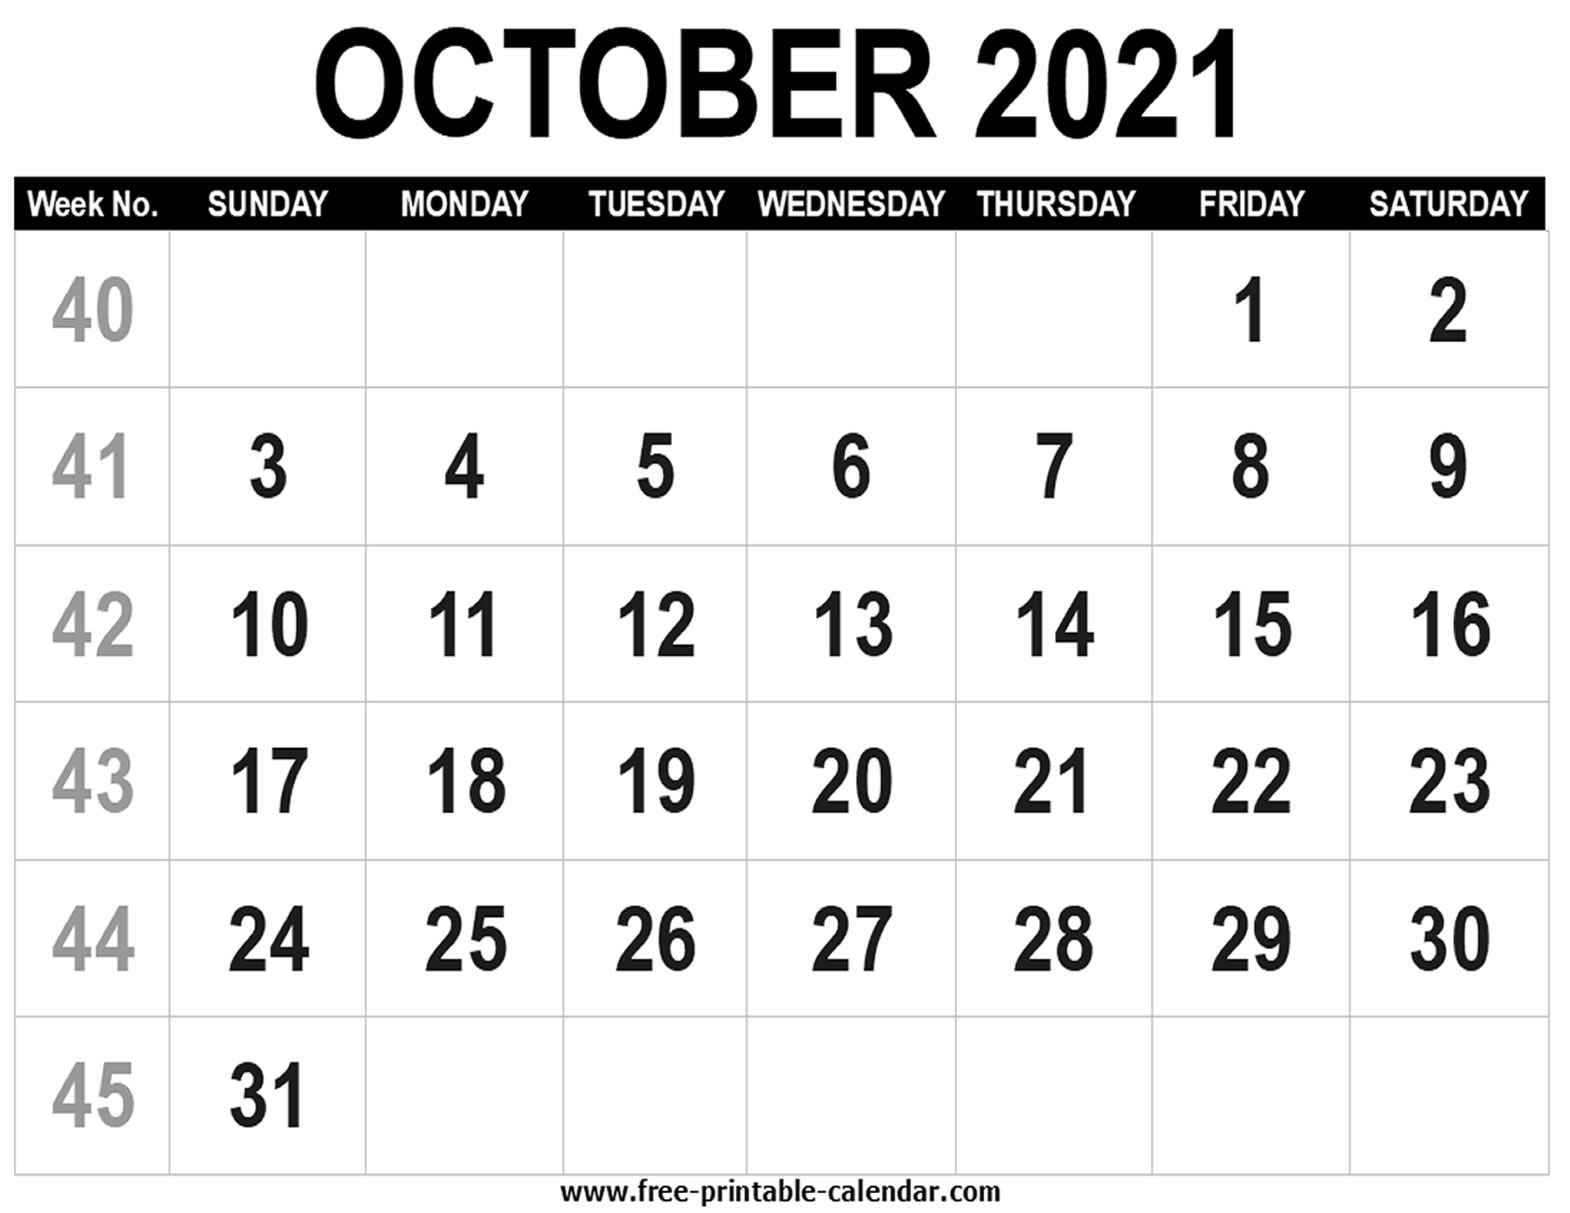 Blank Calendar 2021 October - Free-Printable-Calendar